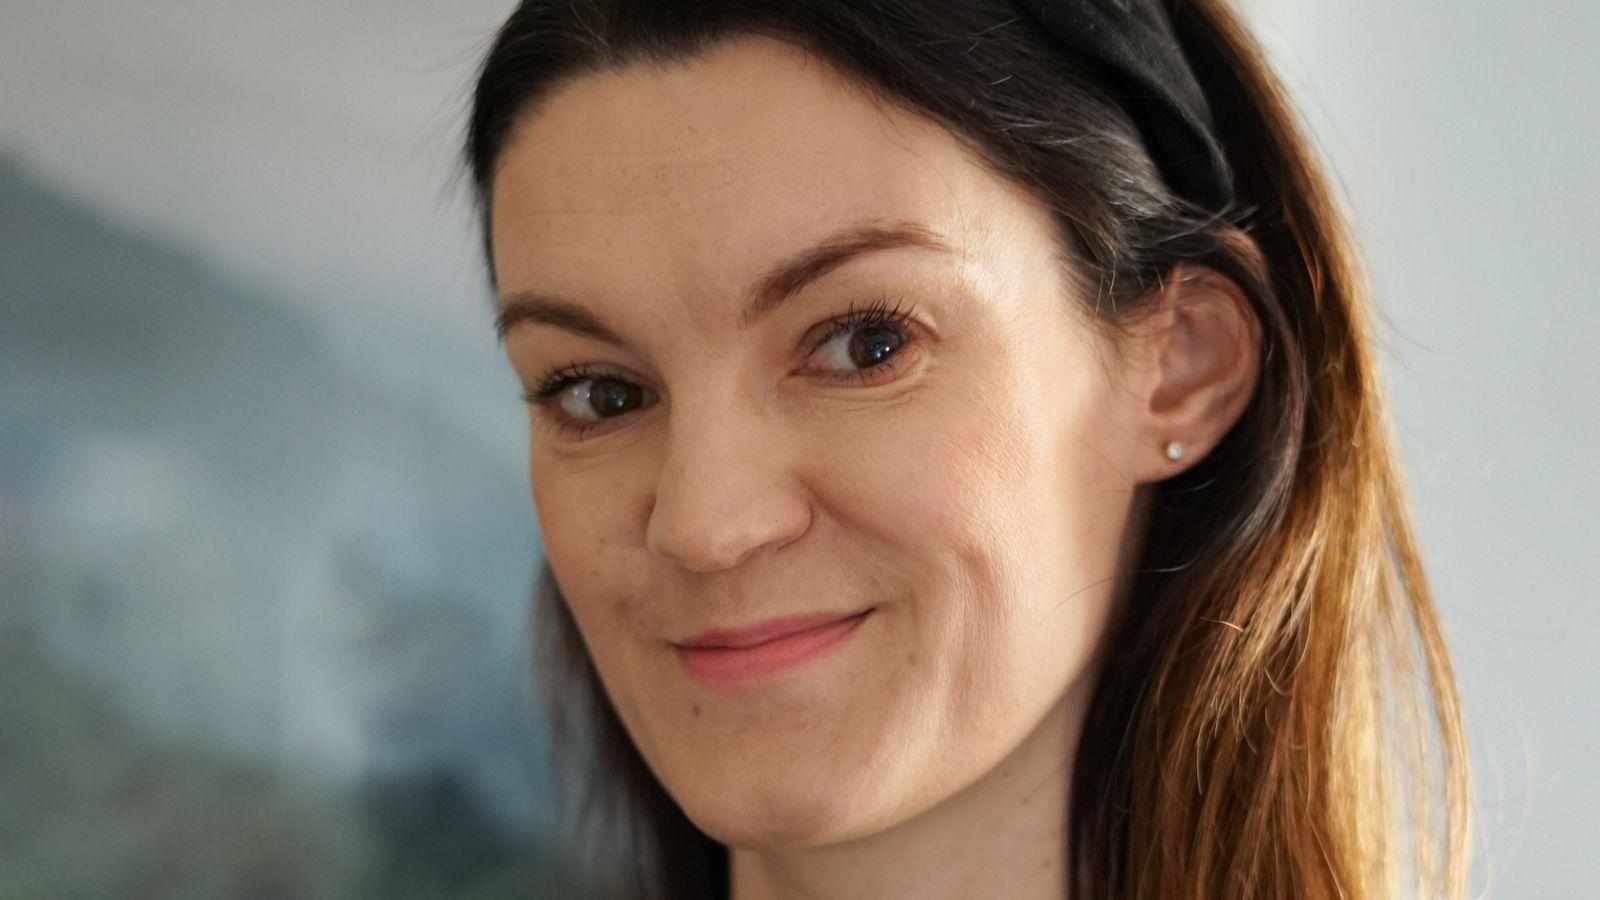 Nowa Creative Strategist w Saatchi & Saatchi awanse mediarun saatchisaatchi